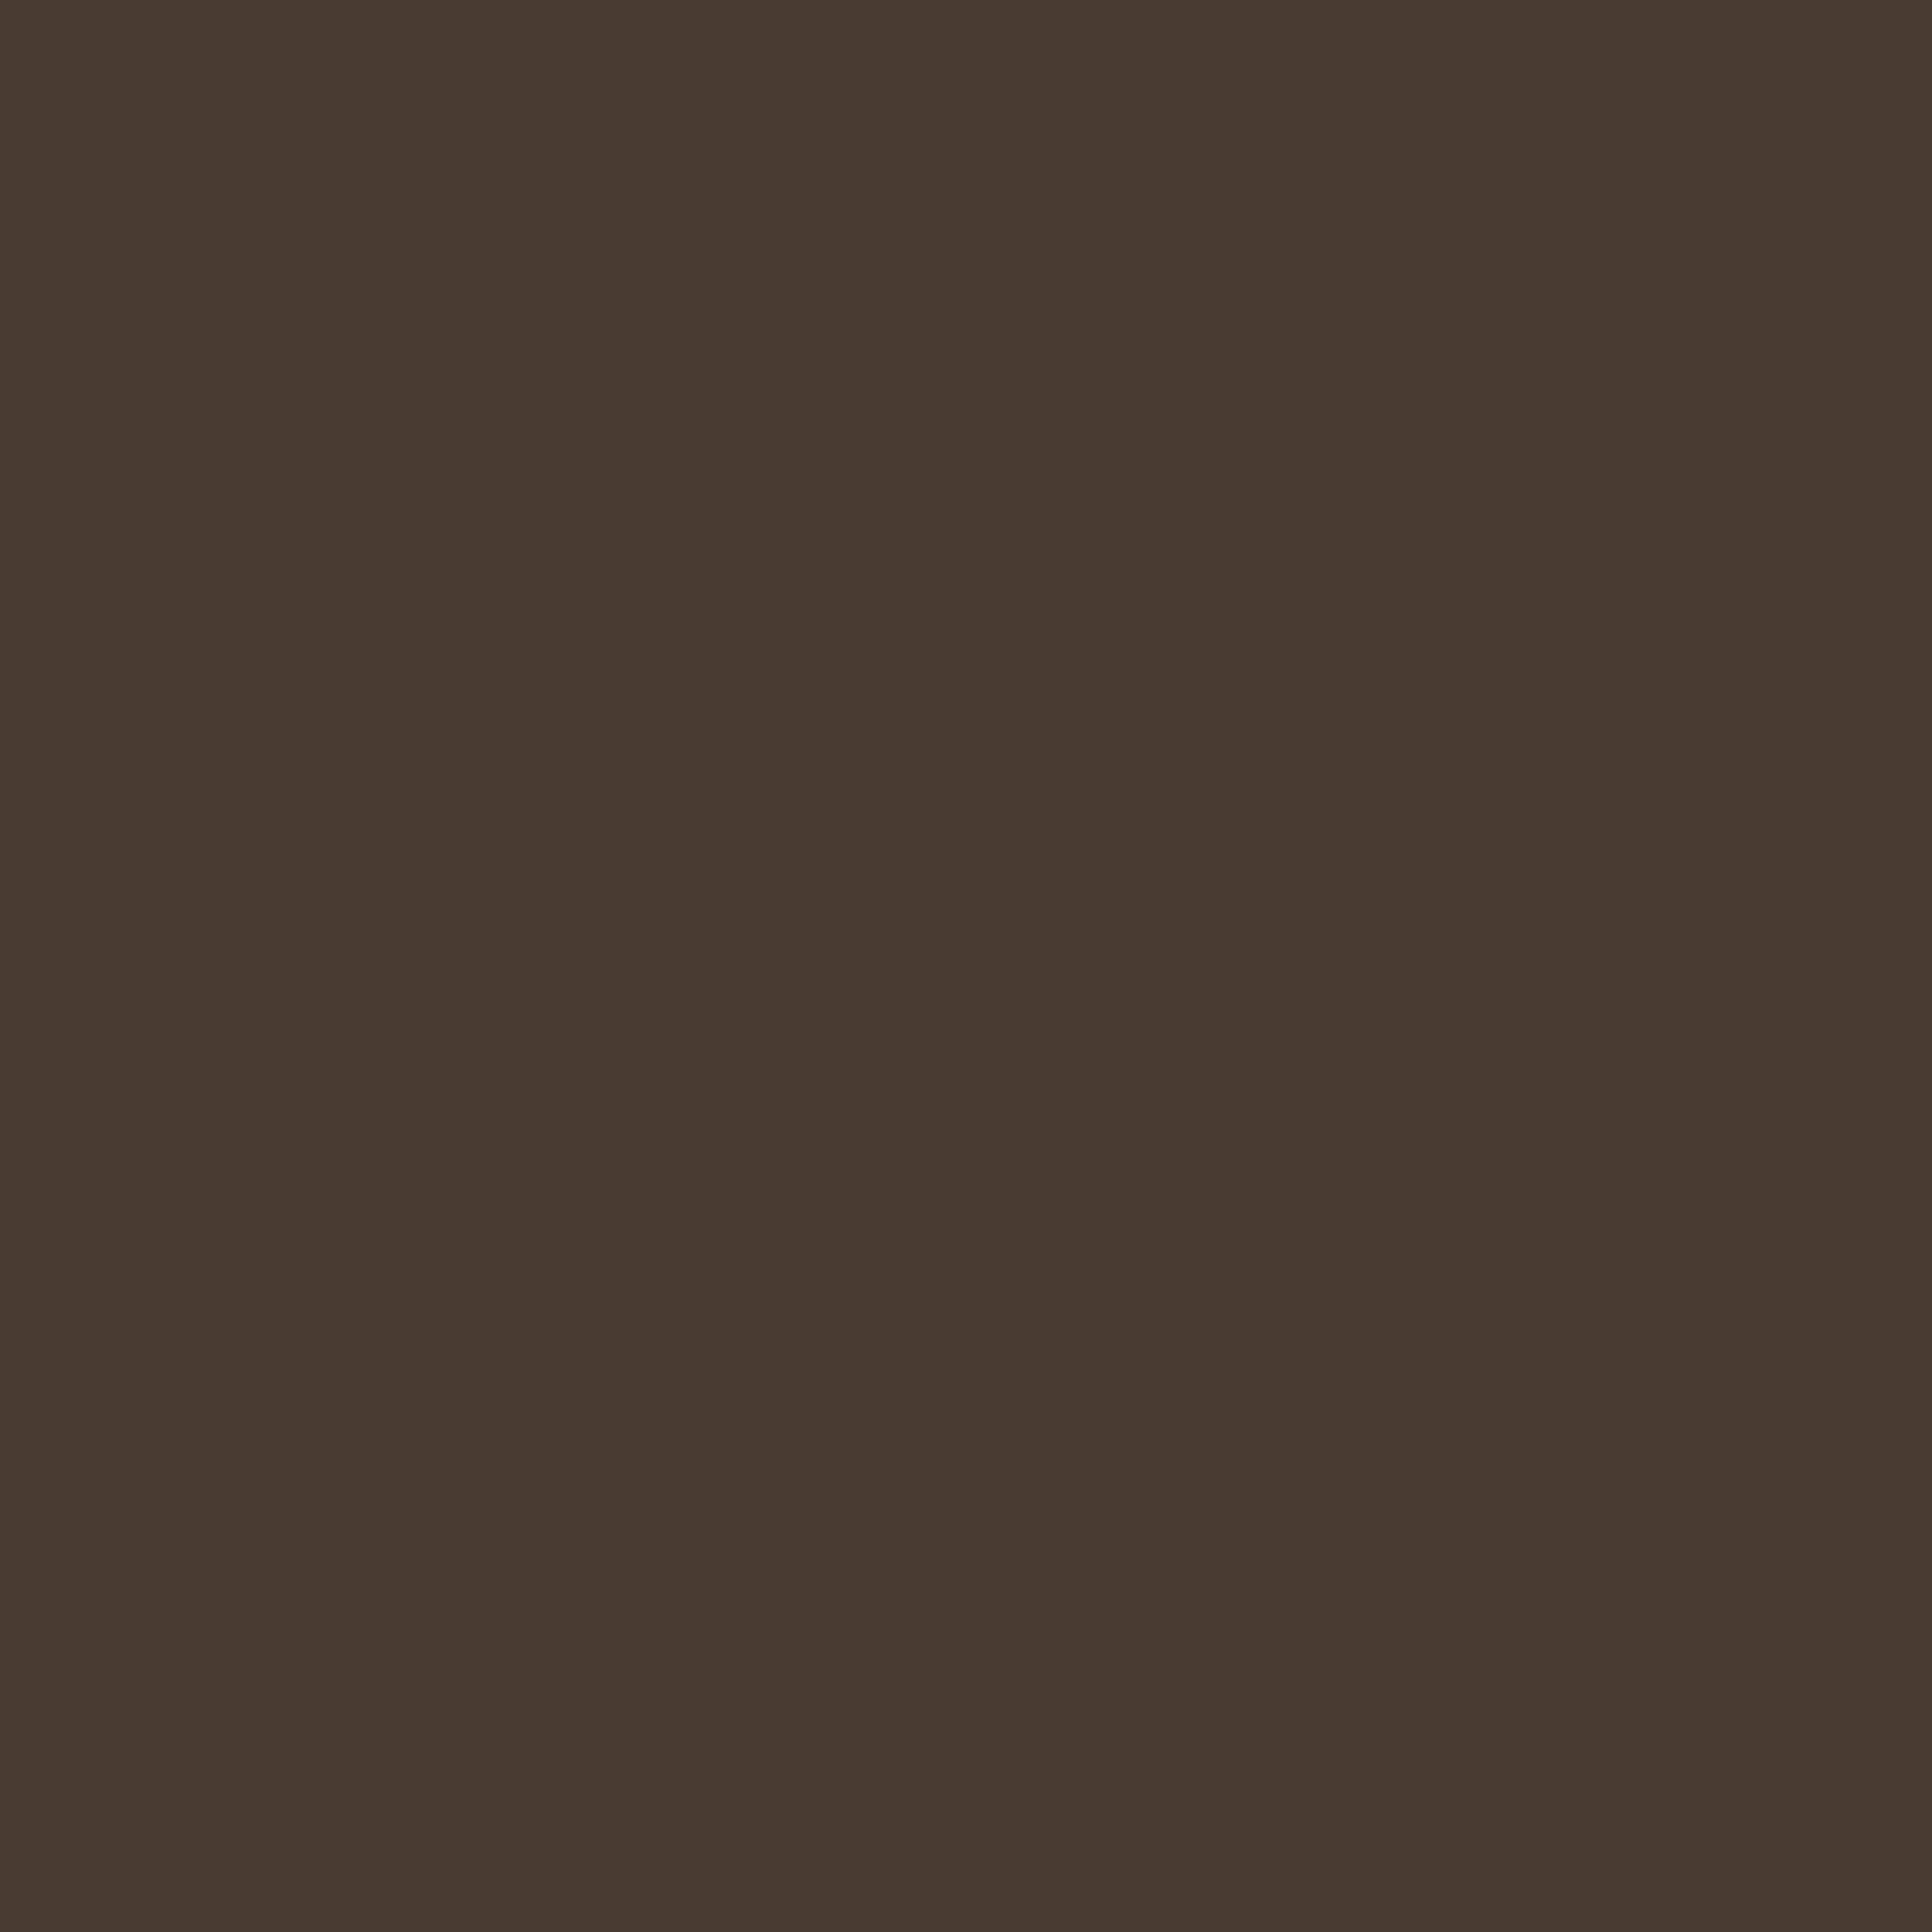 3600x3600 Dark Lava Solid Color Background